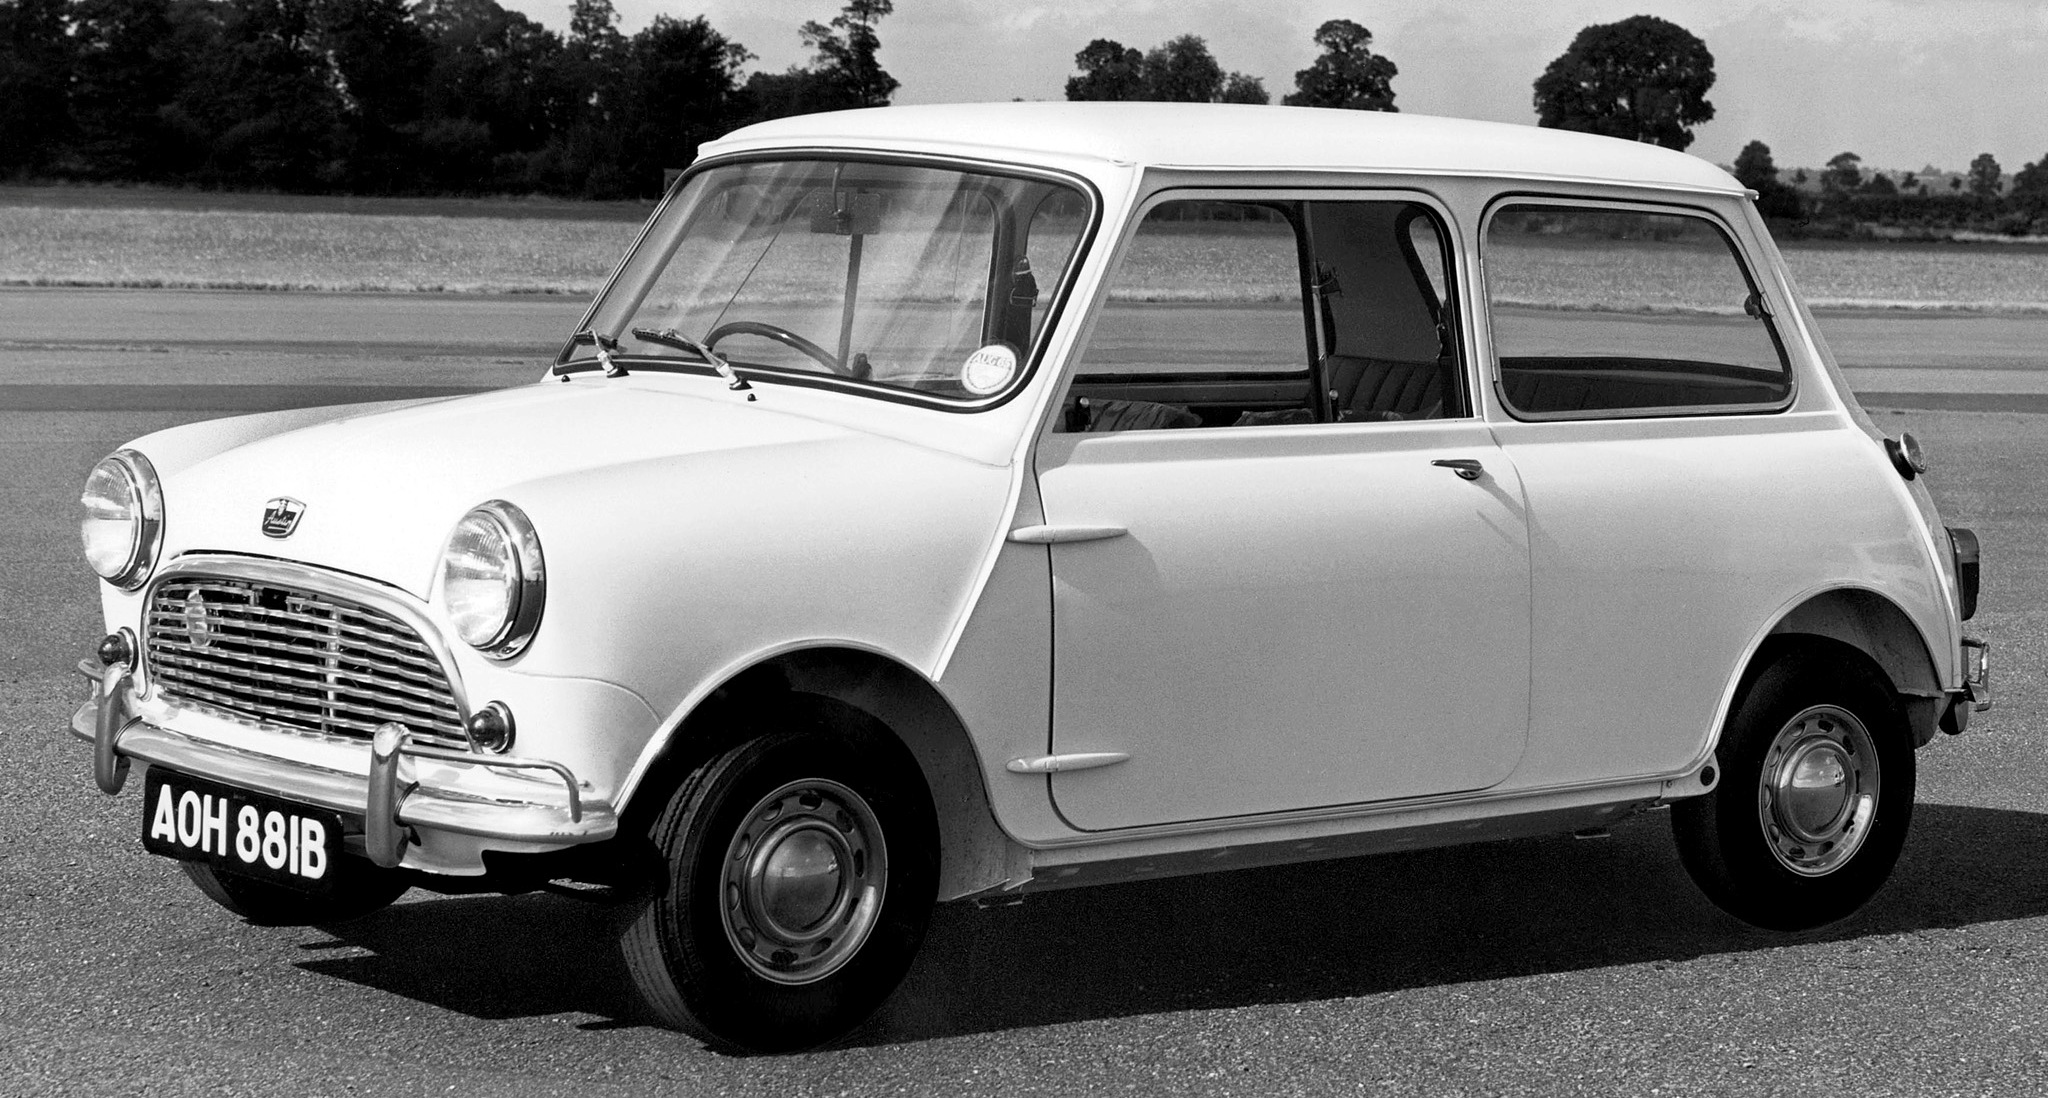 austin mini eleito carro ingl s mais importante da hist ria all the cars. Black Bedroom Furniture Sets. Home Design Ideas